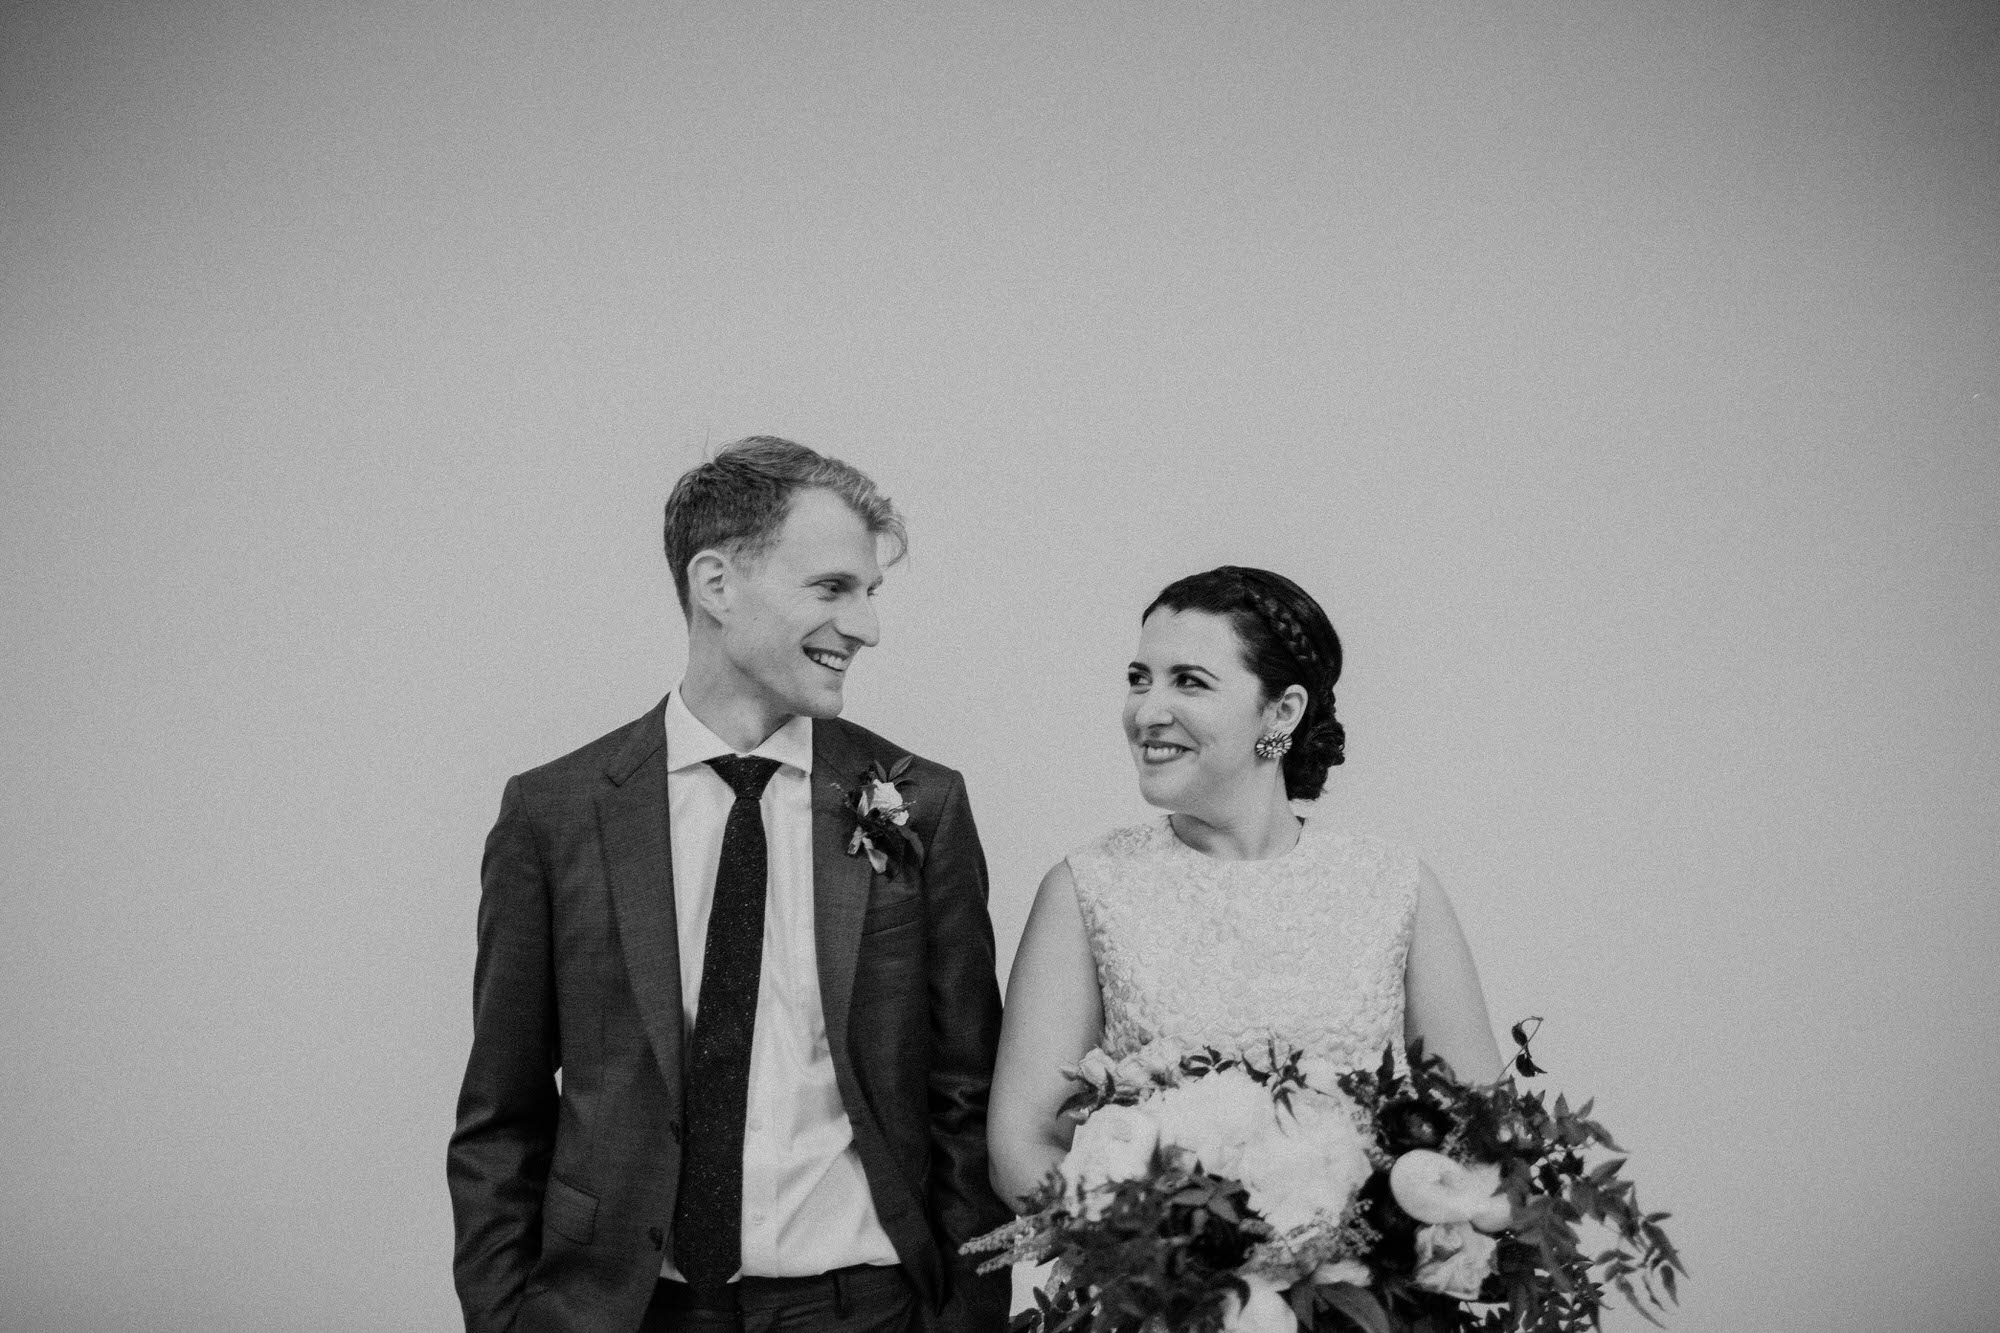 los-angeles-wedding-photographer-millwick-120.jpg